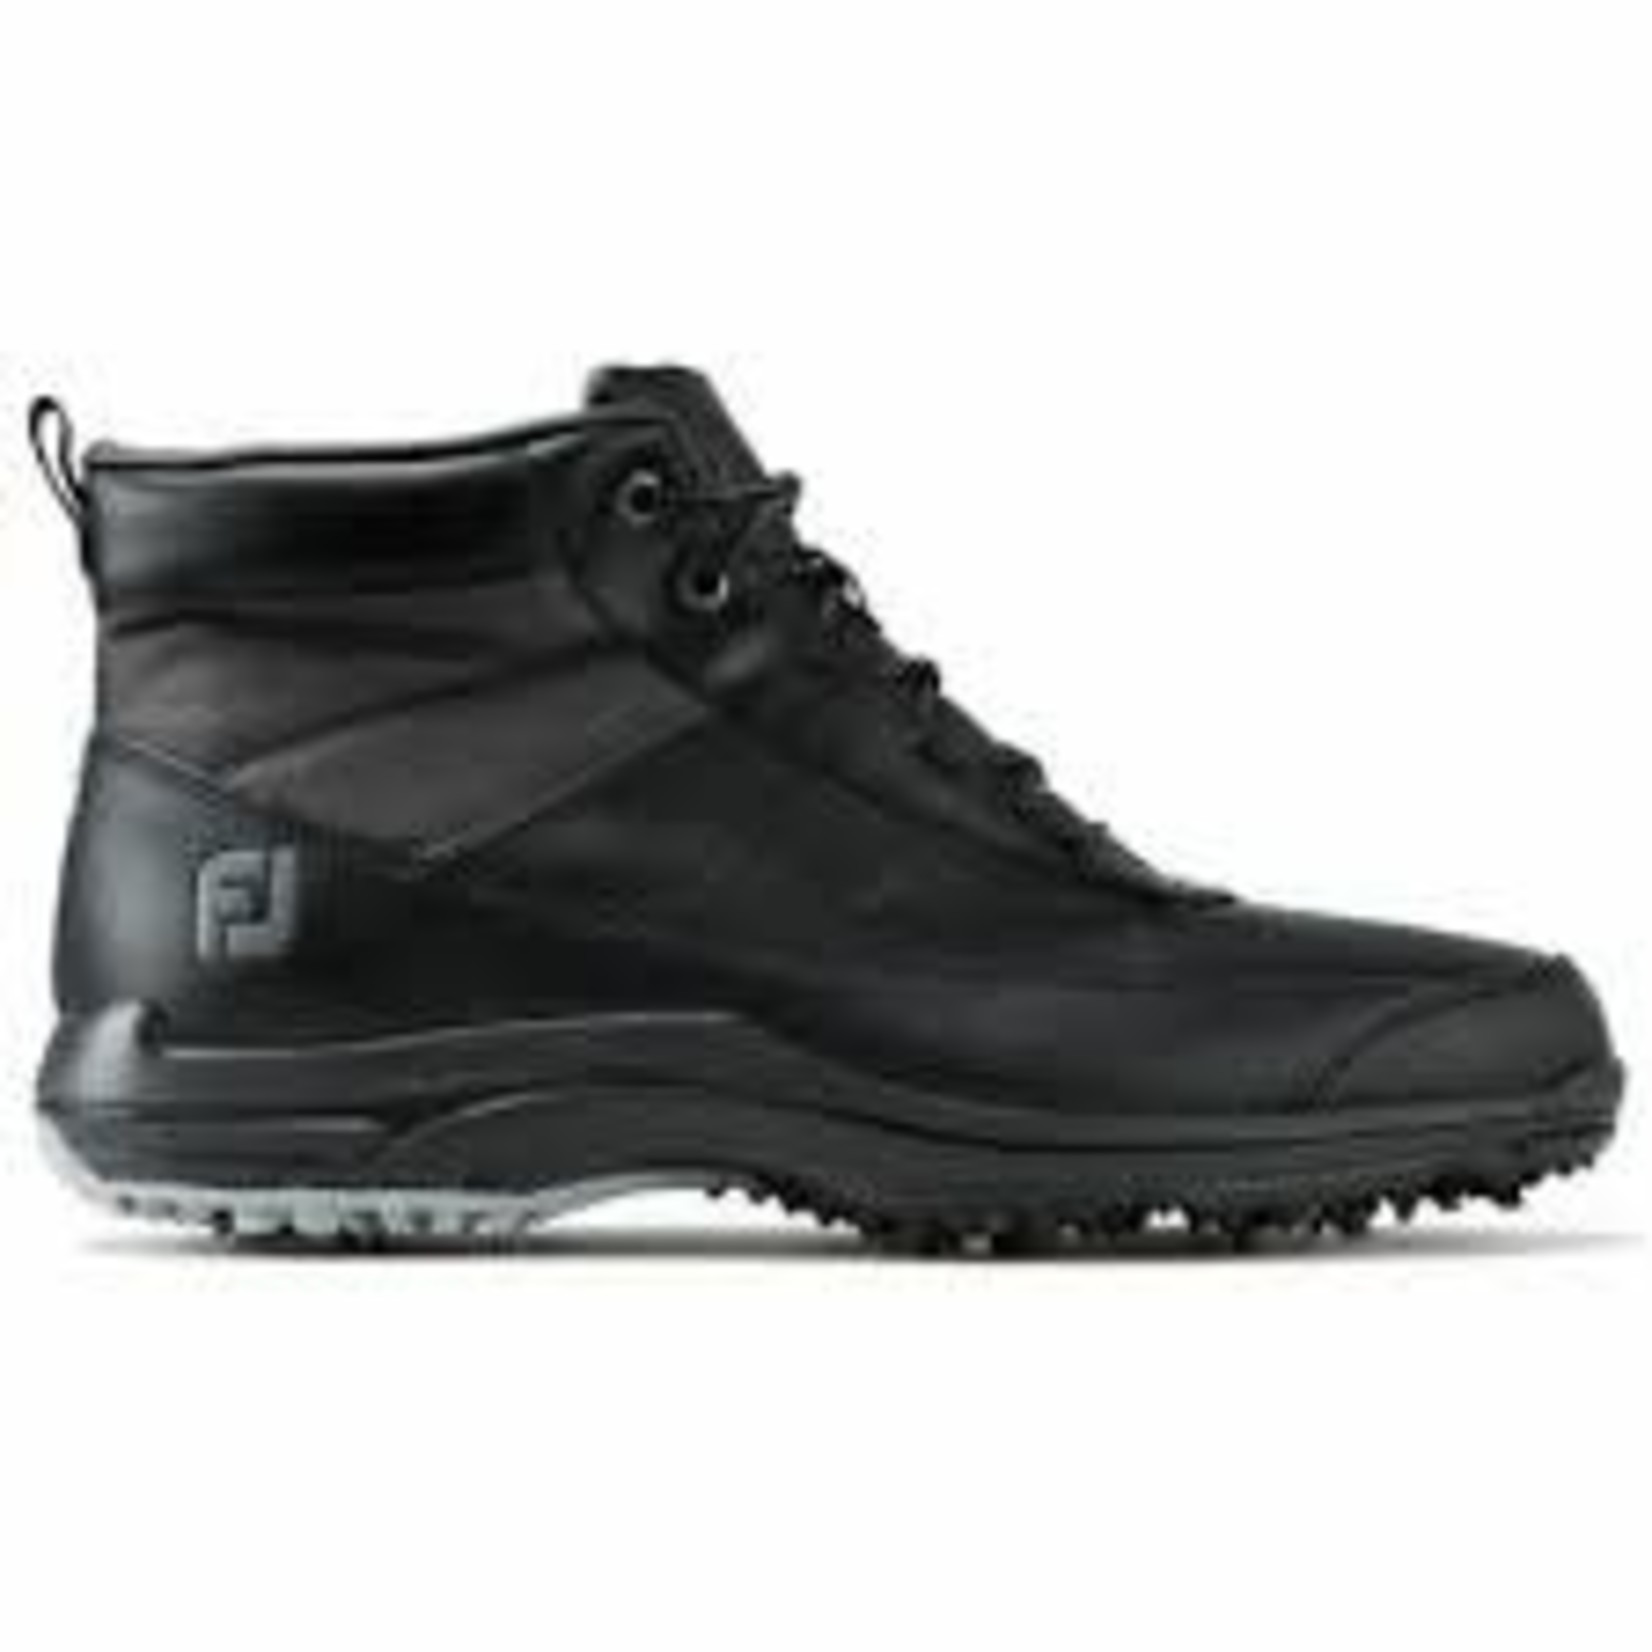 Footjoy FootJoy Boot Mens WIDE